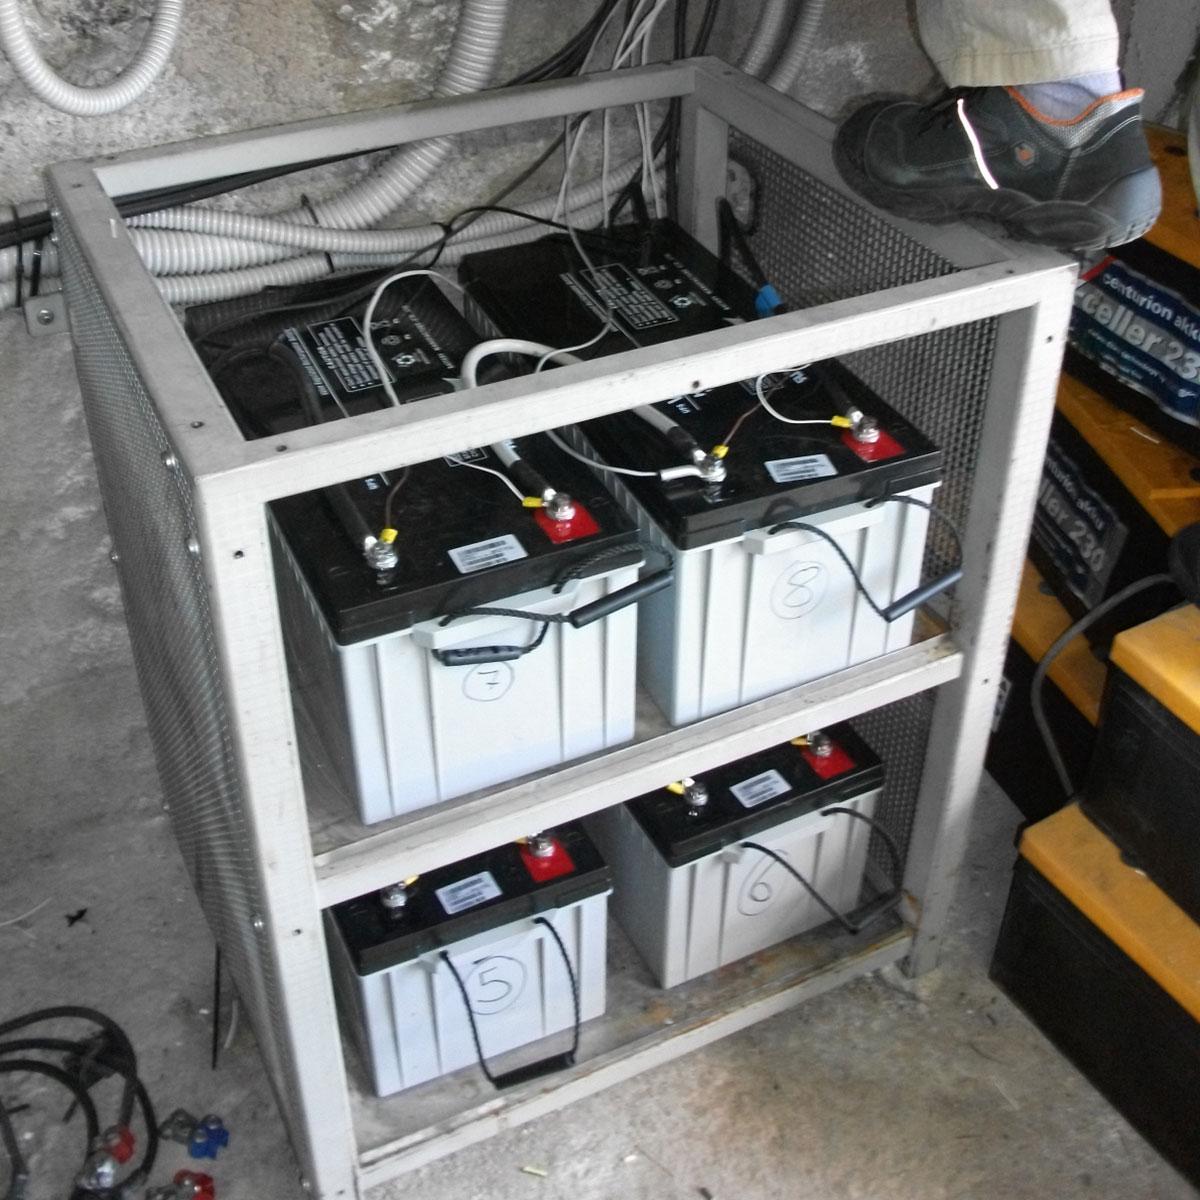 batterie-fotovoltaico-rifugio-1.jpg